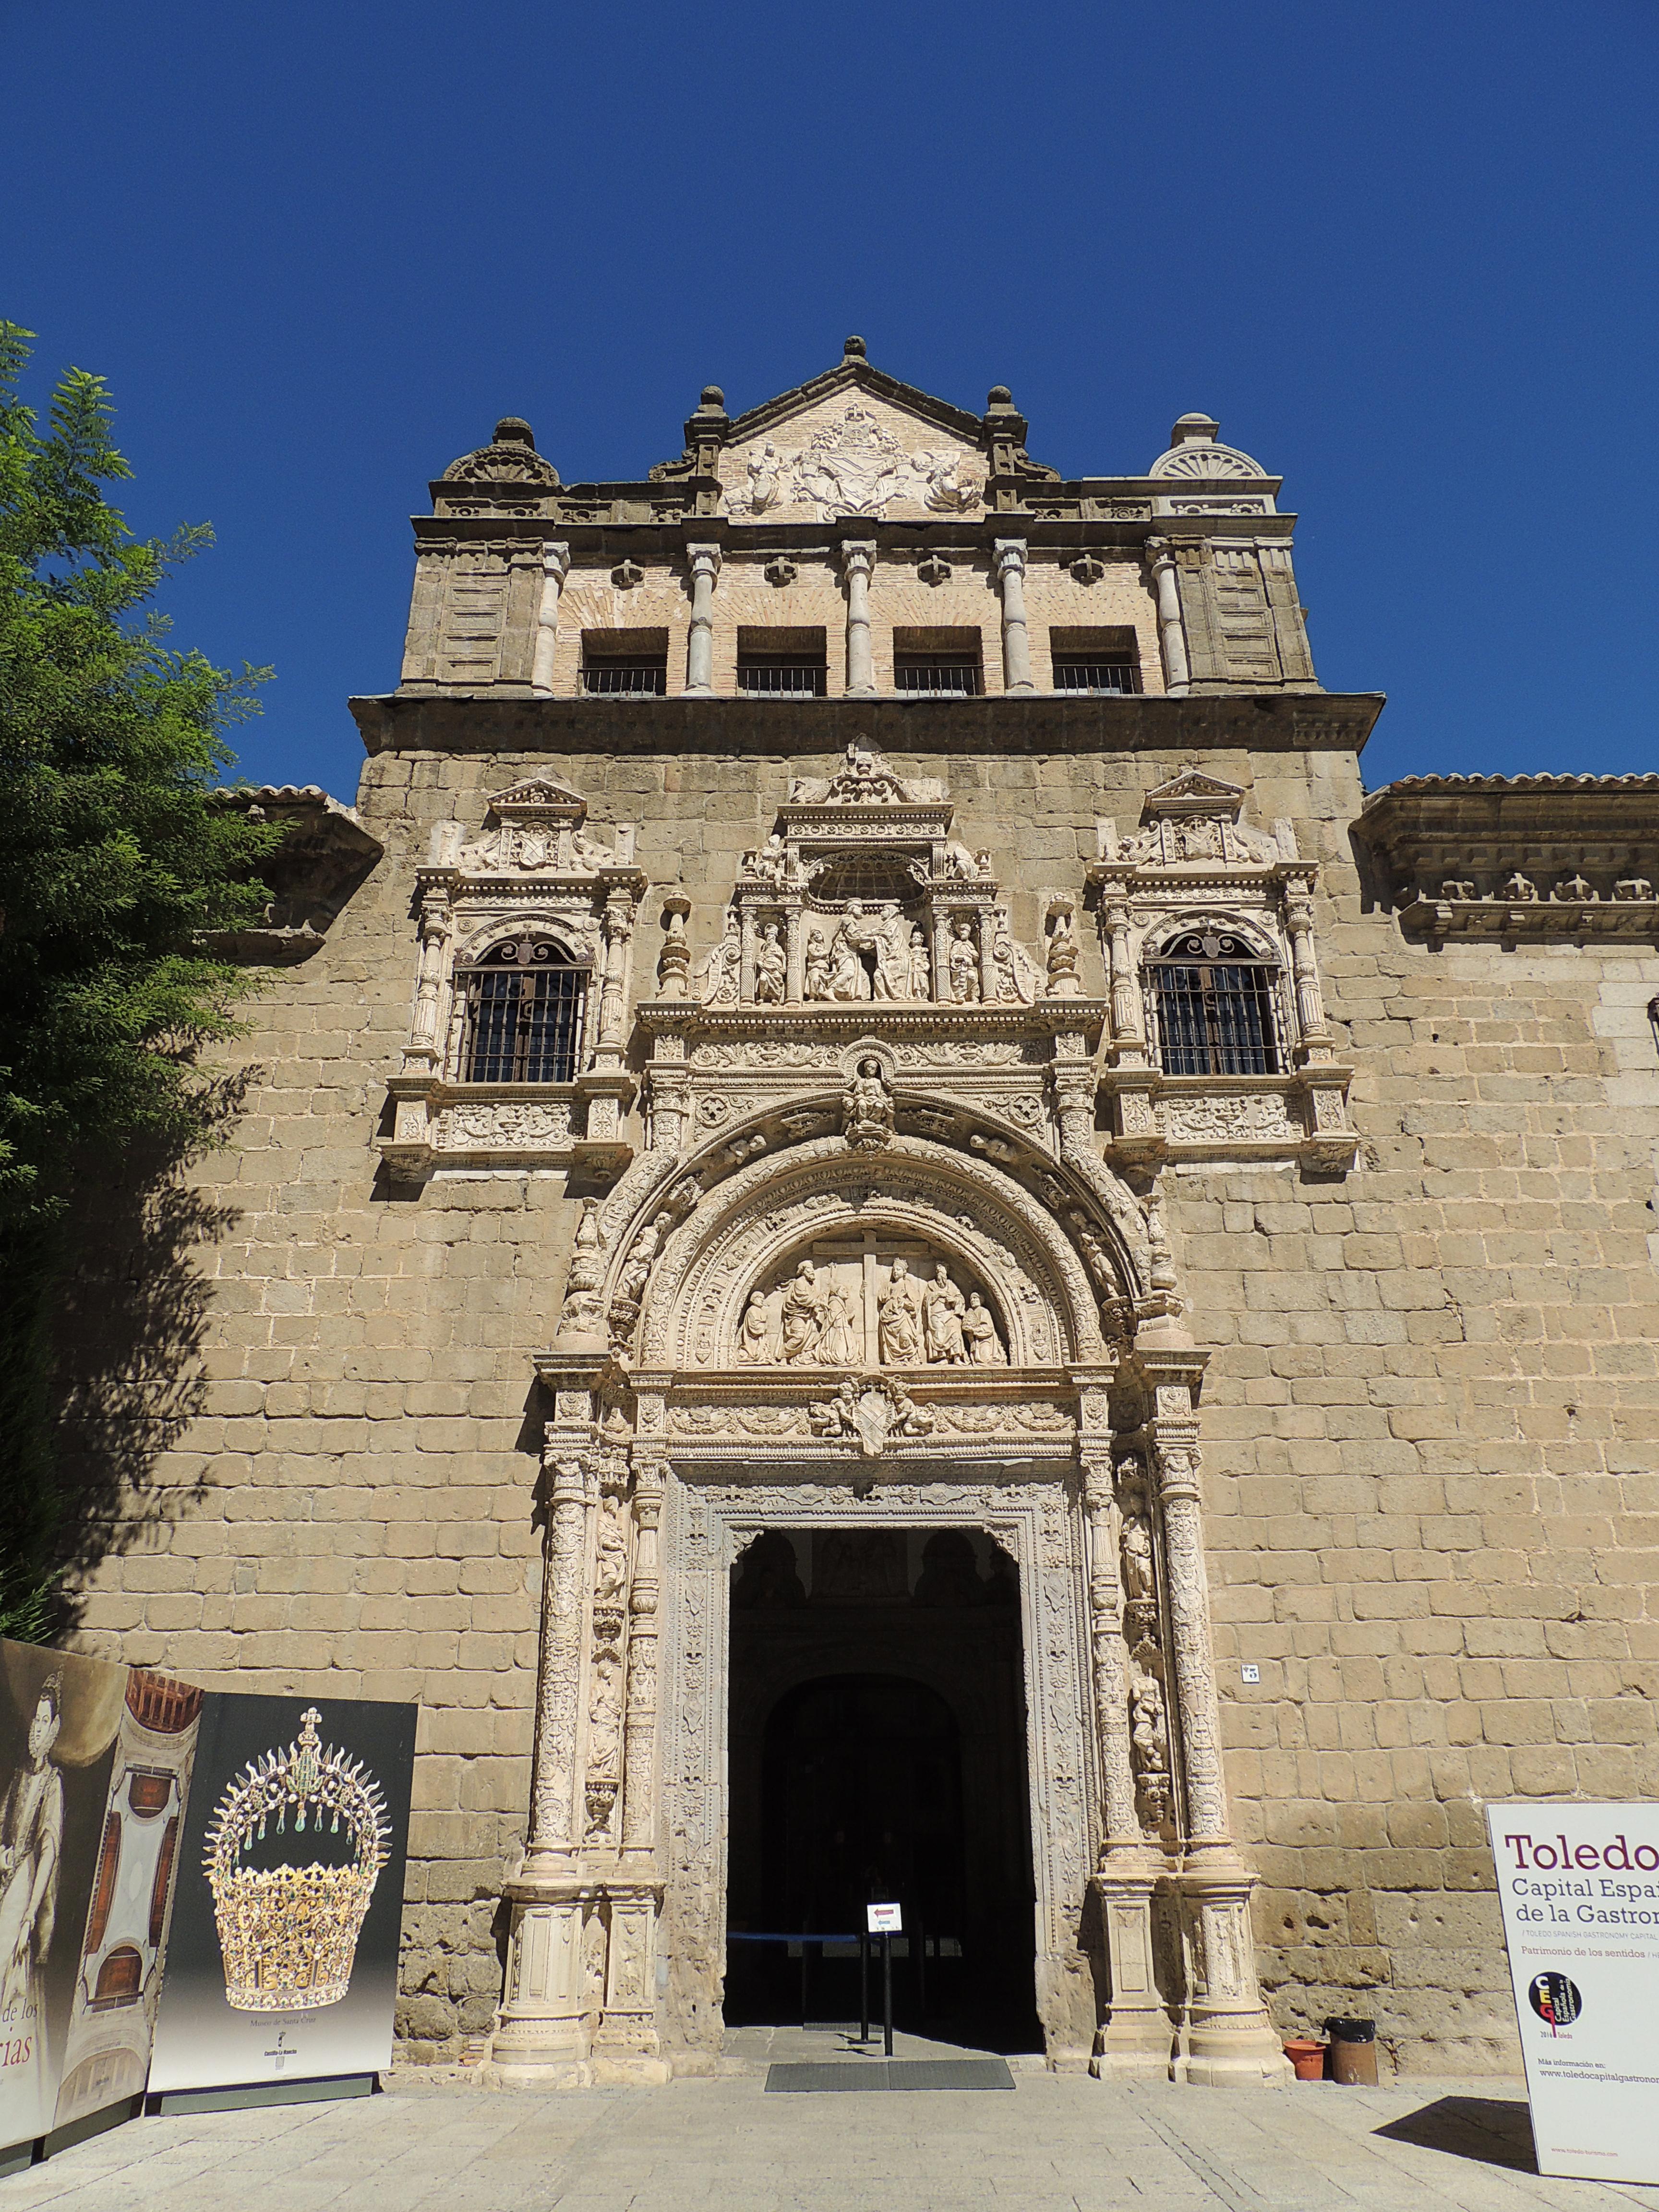 Museo De Santa Cruz.File Toledo Museo De Santa Cruz Jpg Wikimedia Commons